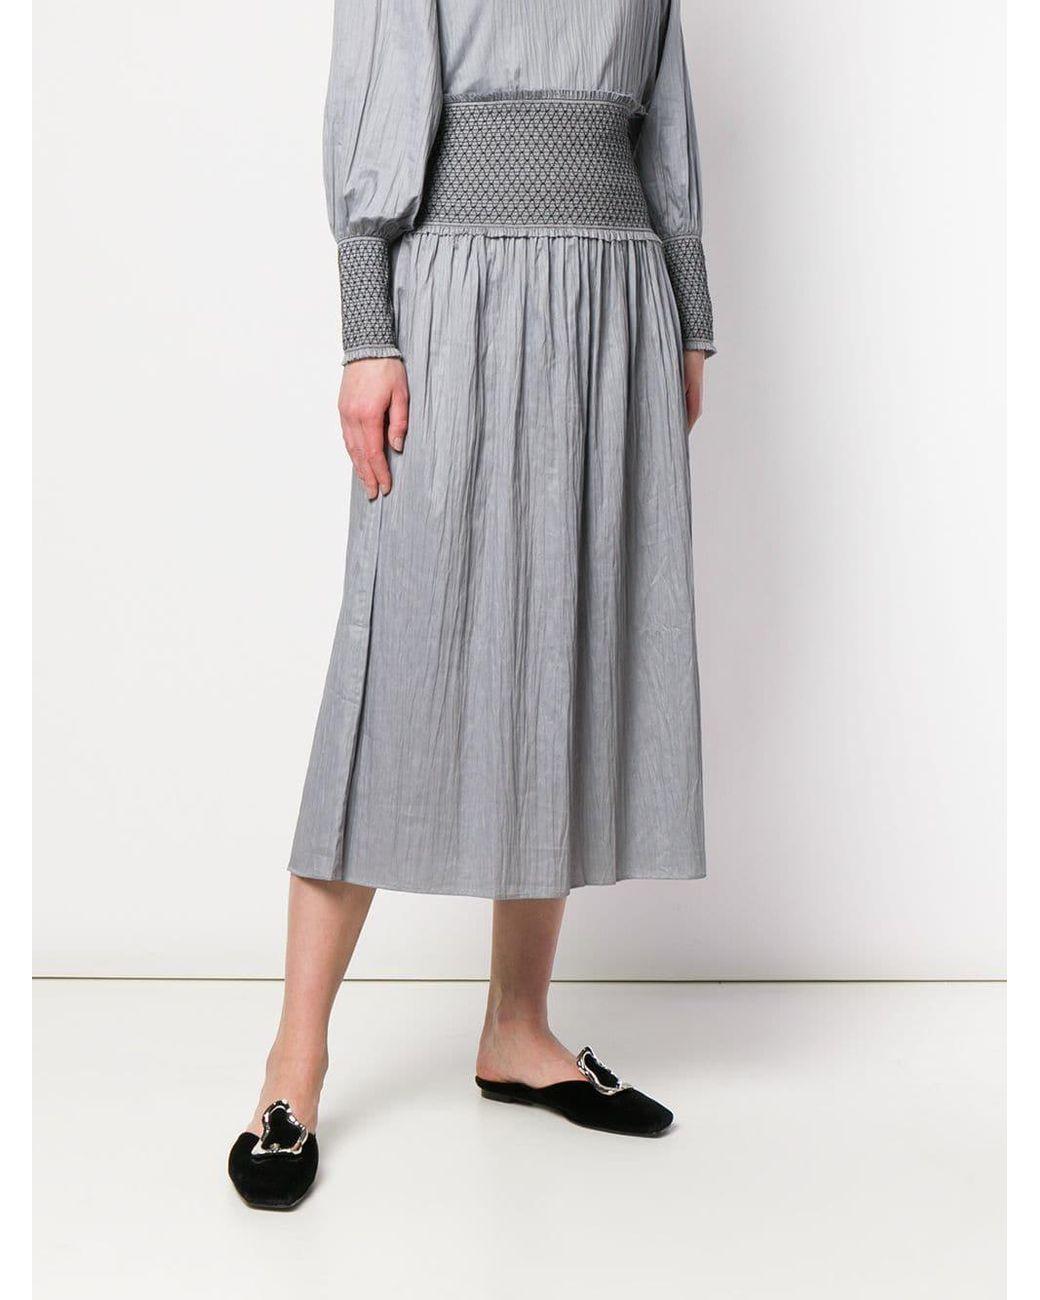 Ladies Women/'s Sparkly Glitter Lurex Elasticated Flared Swing Skirt Plus Size